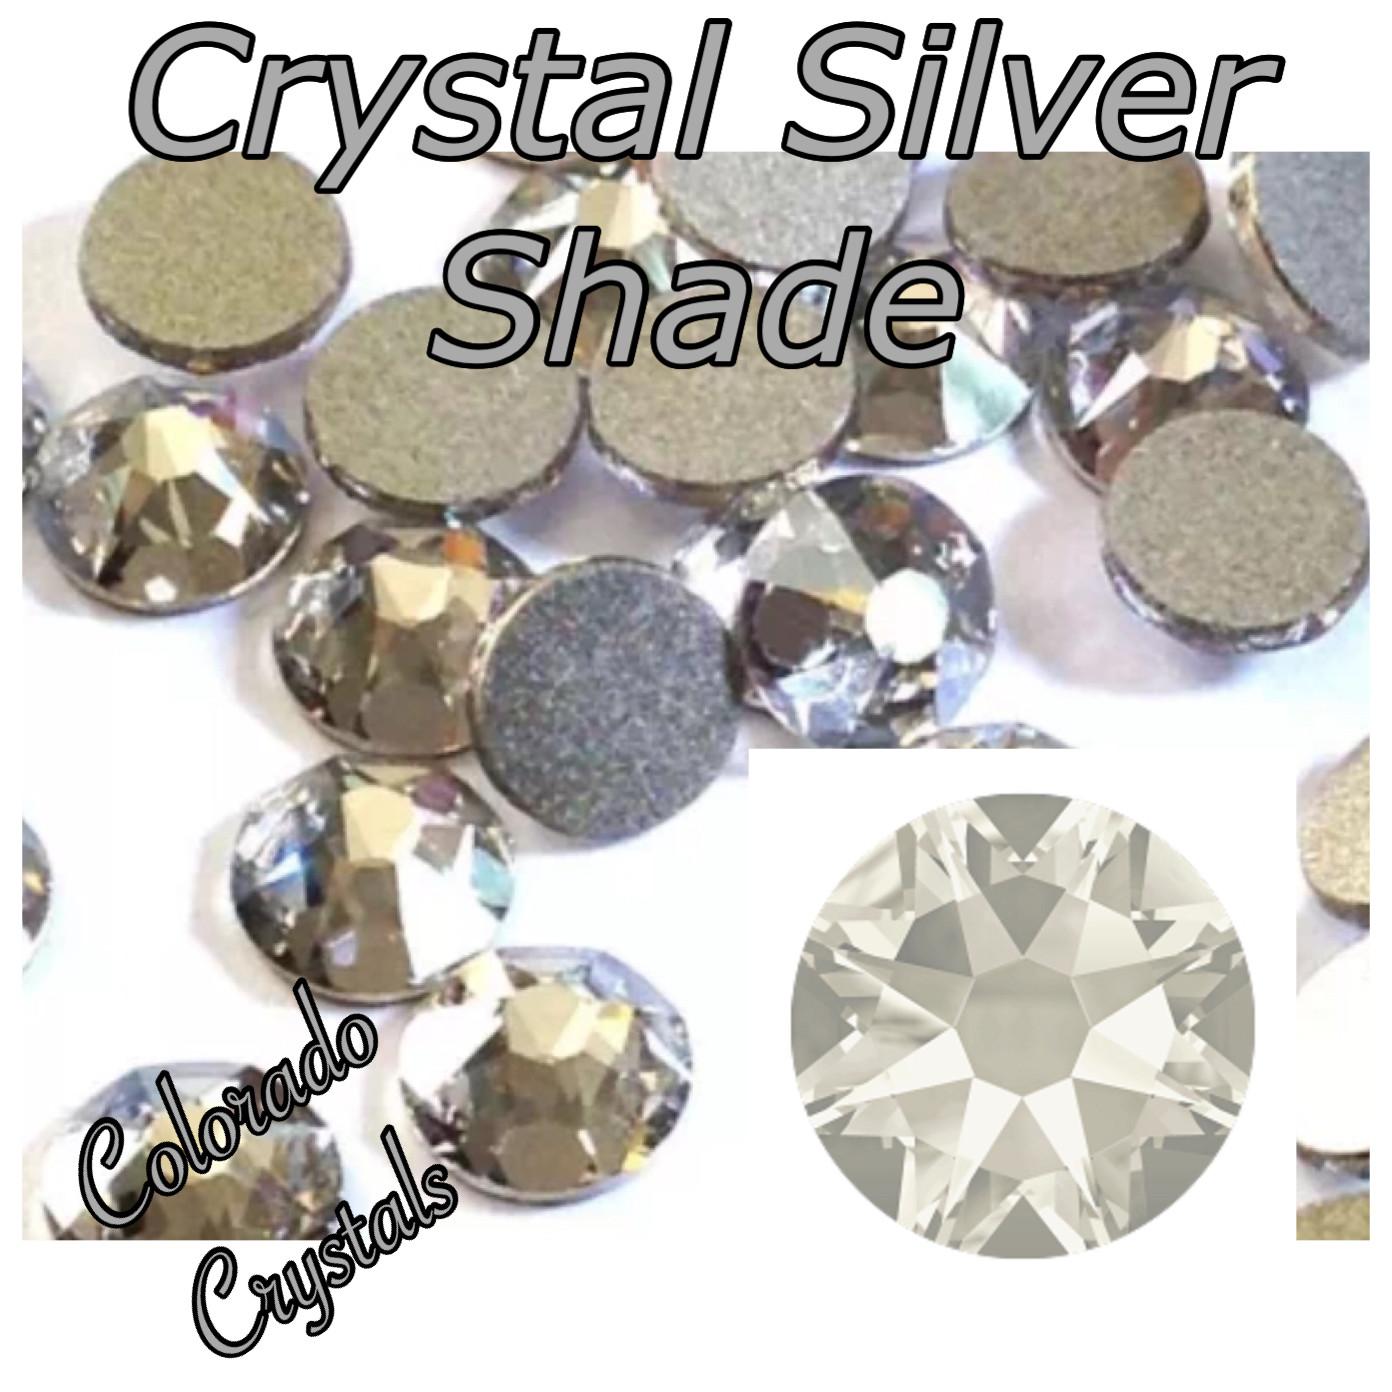 Silver Shade (Crystal) 30ss 2088 Limited Swarovski Rhinestones